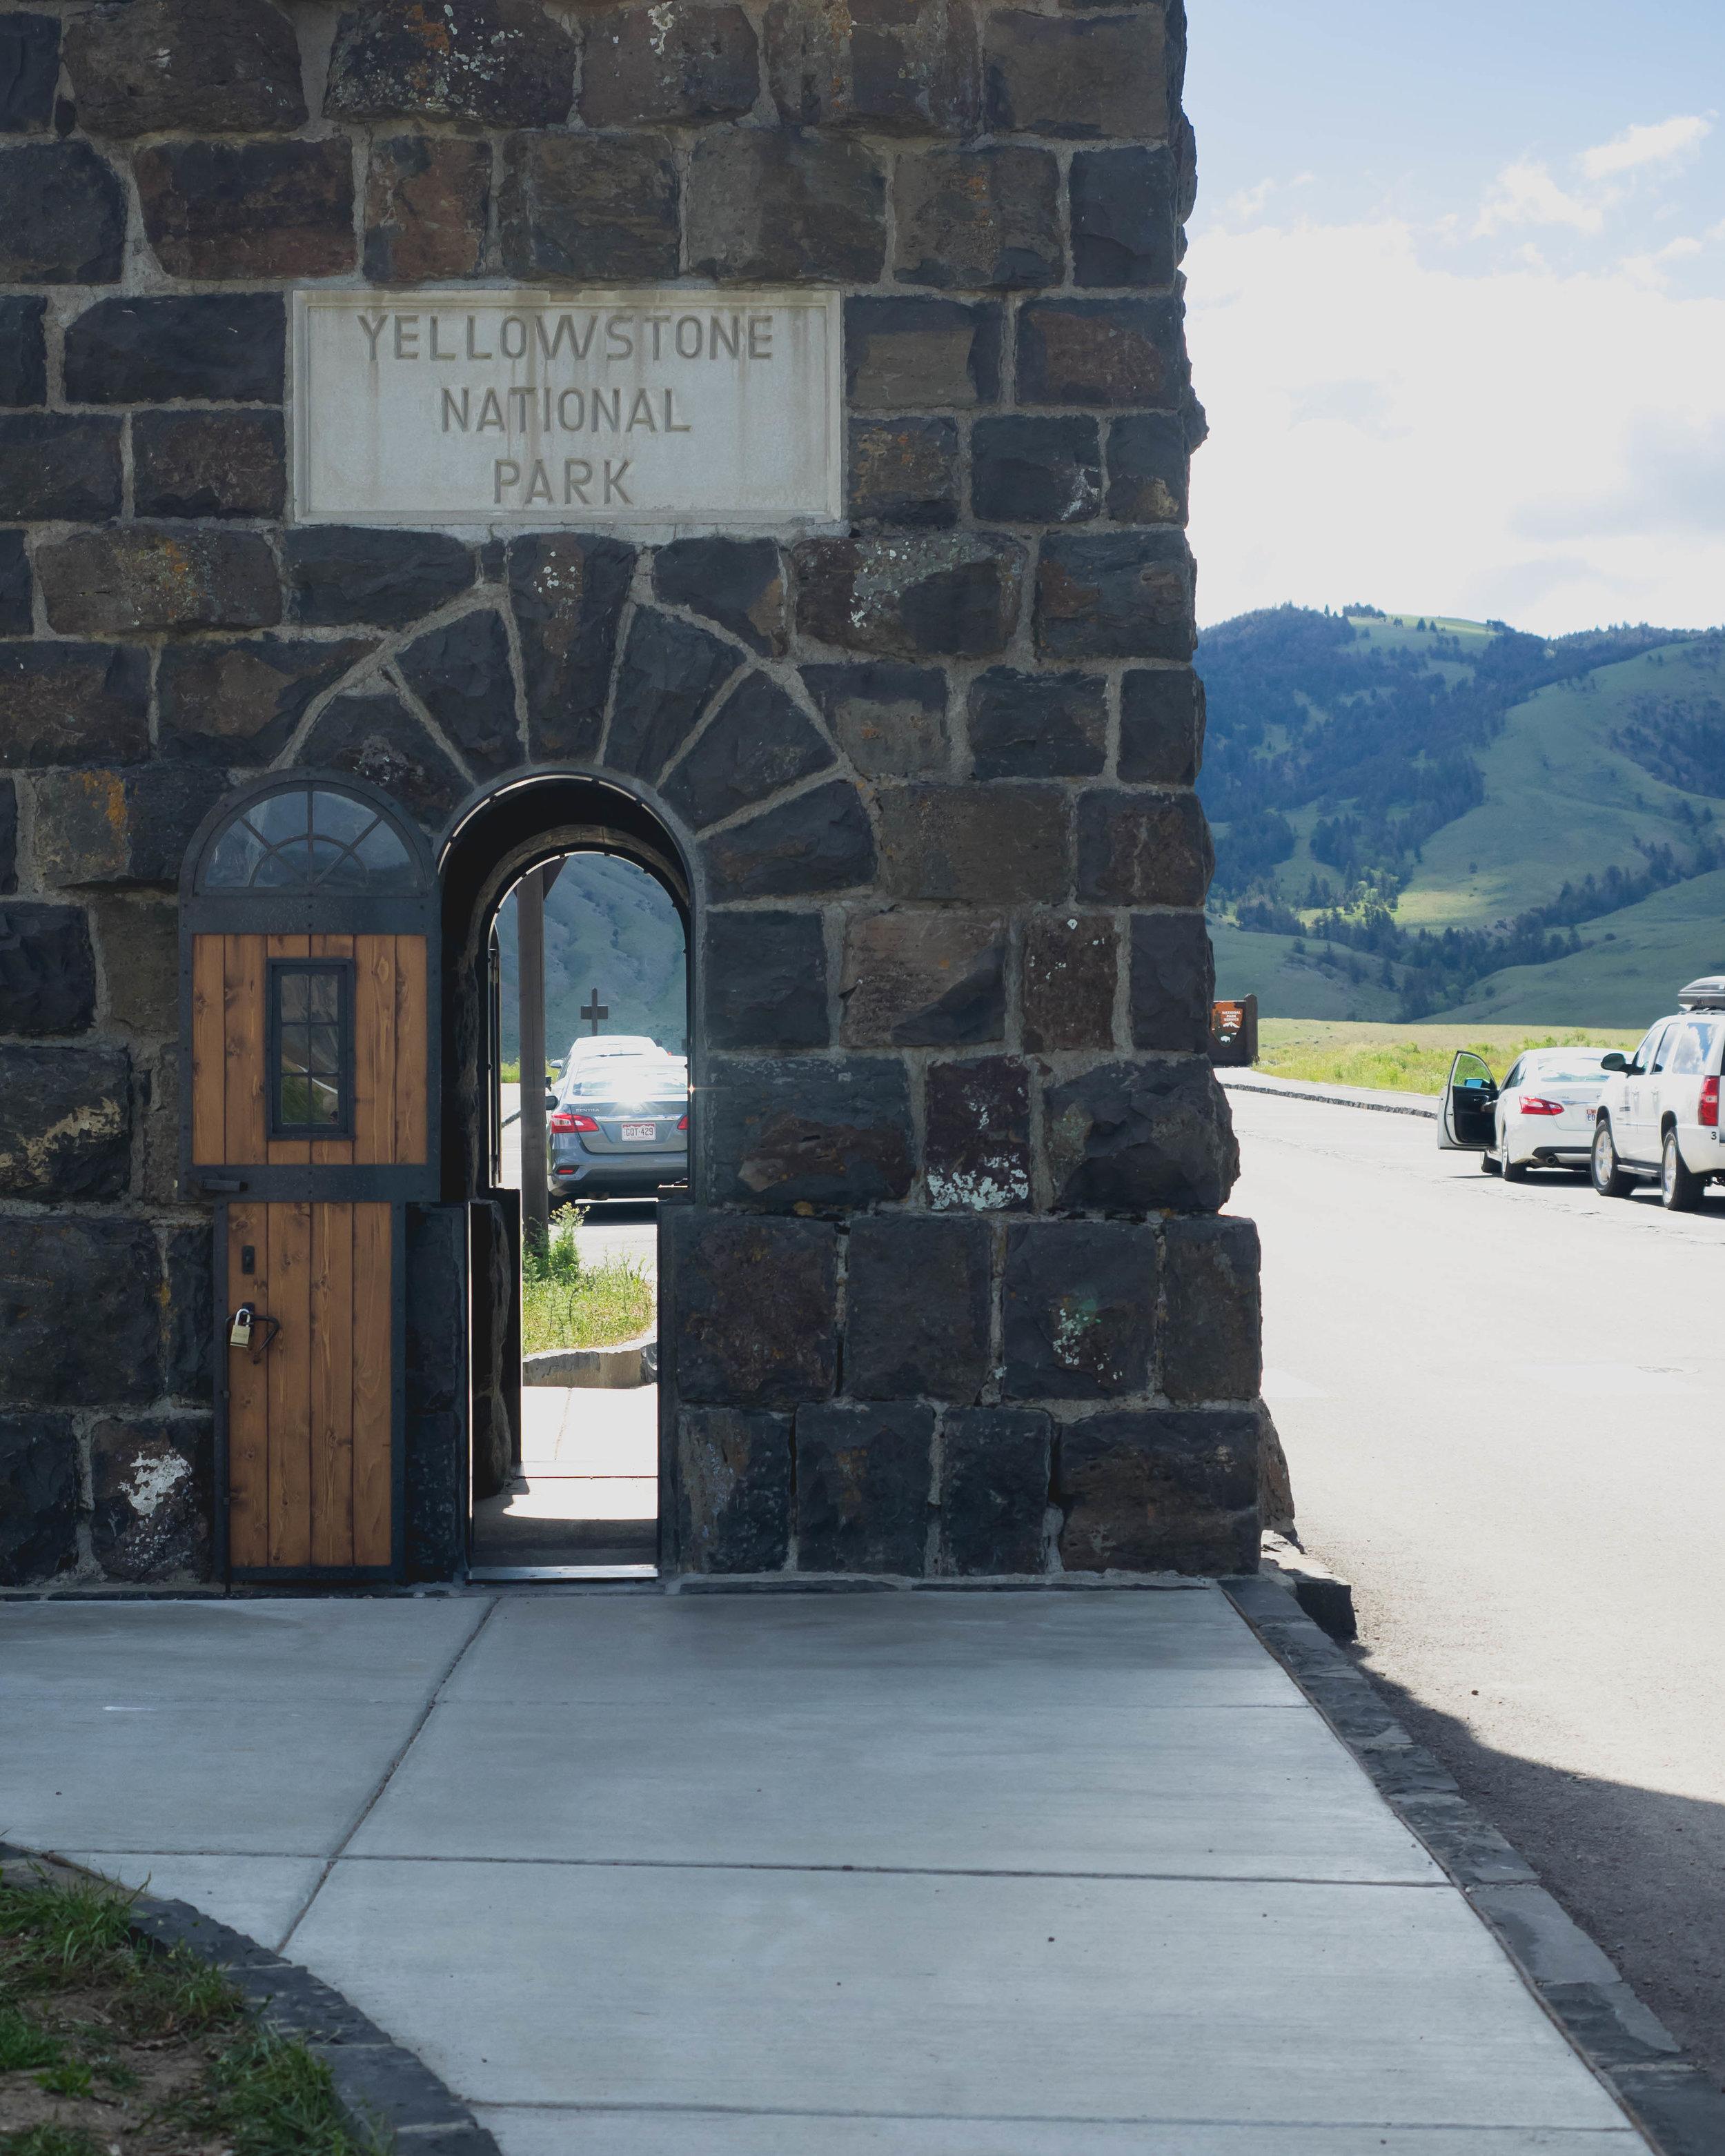 roosevelt arch, original yellowstone national park gate.